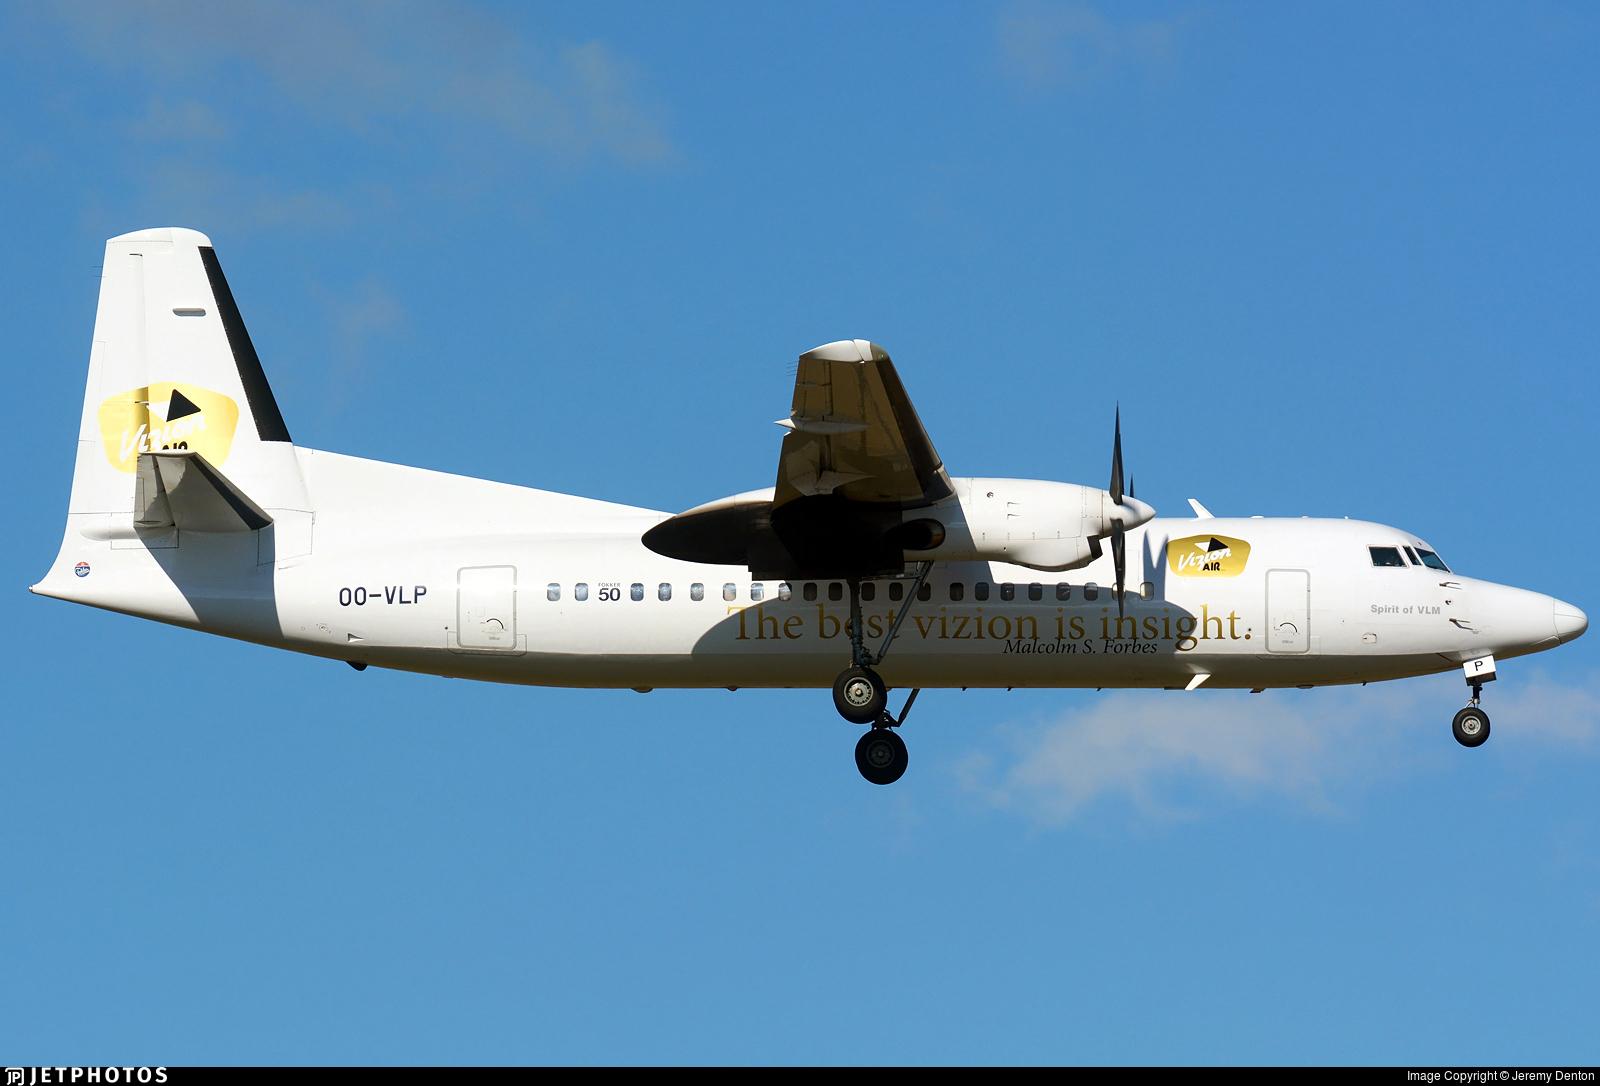 OO-VLP - Fokker 50 - VLM Airlines